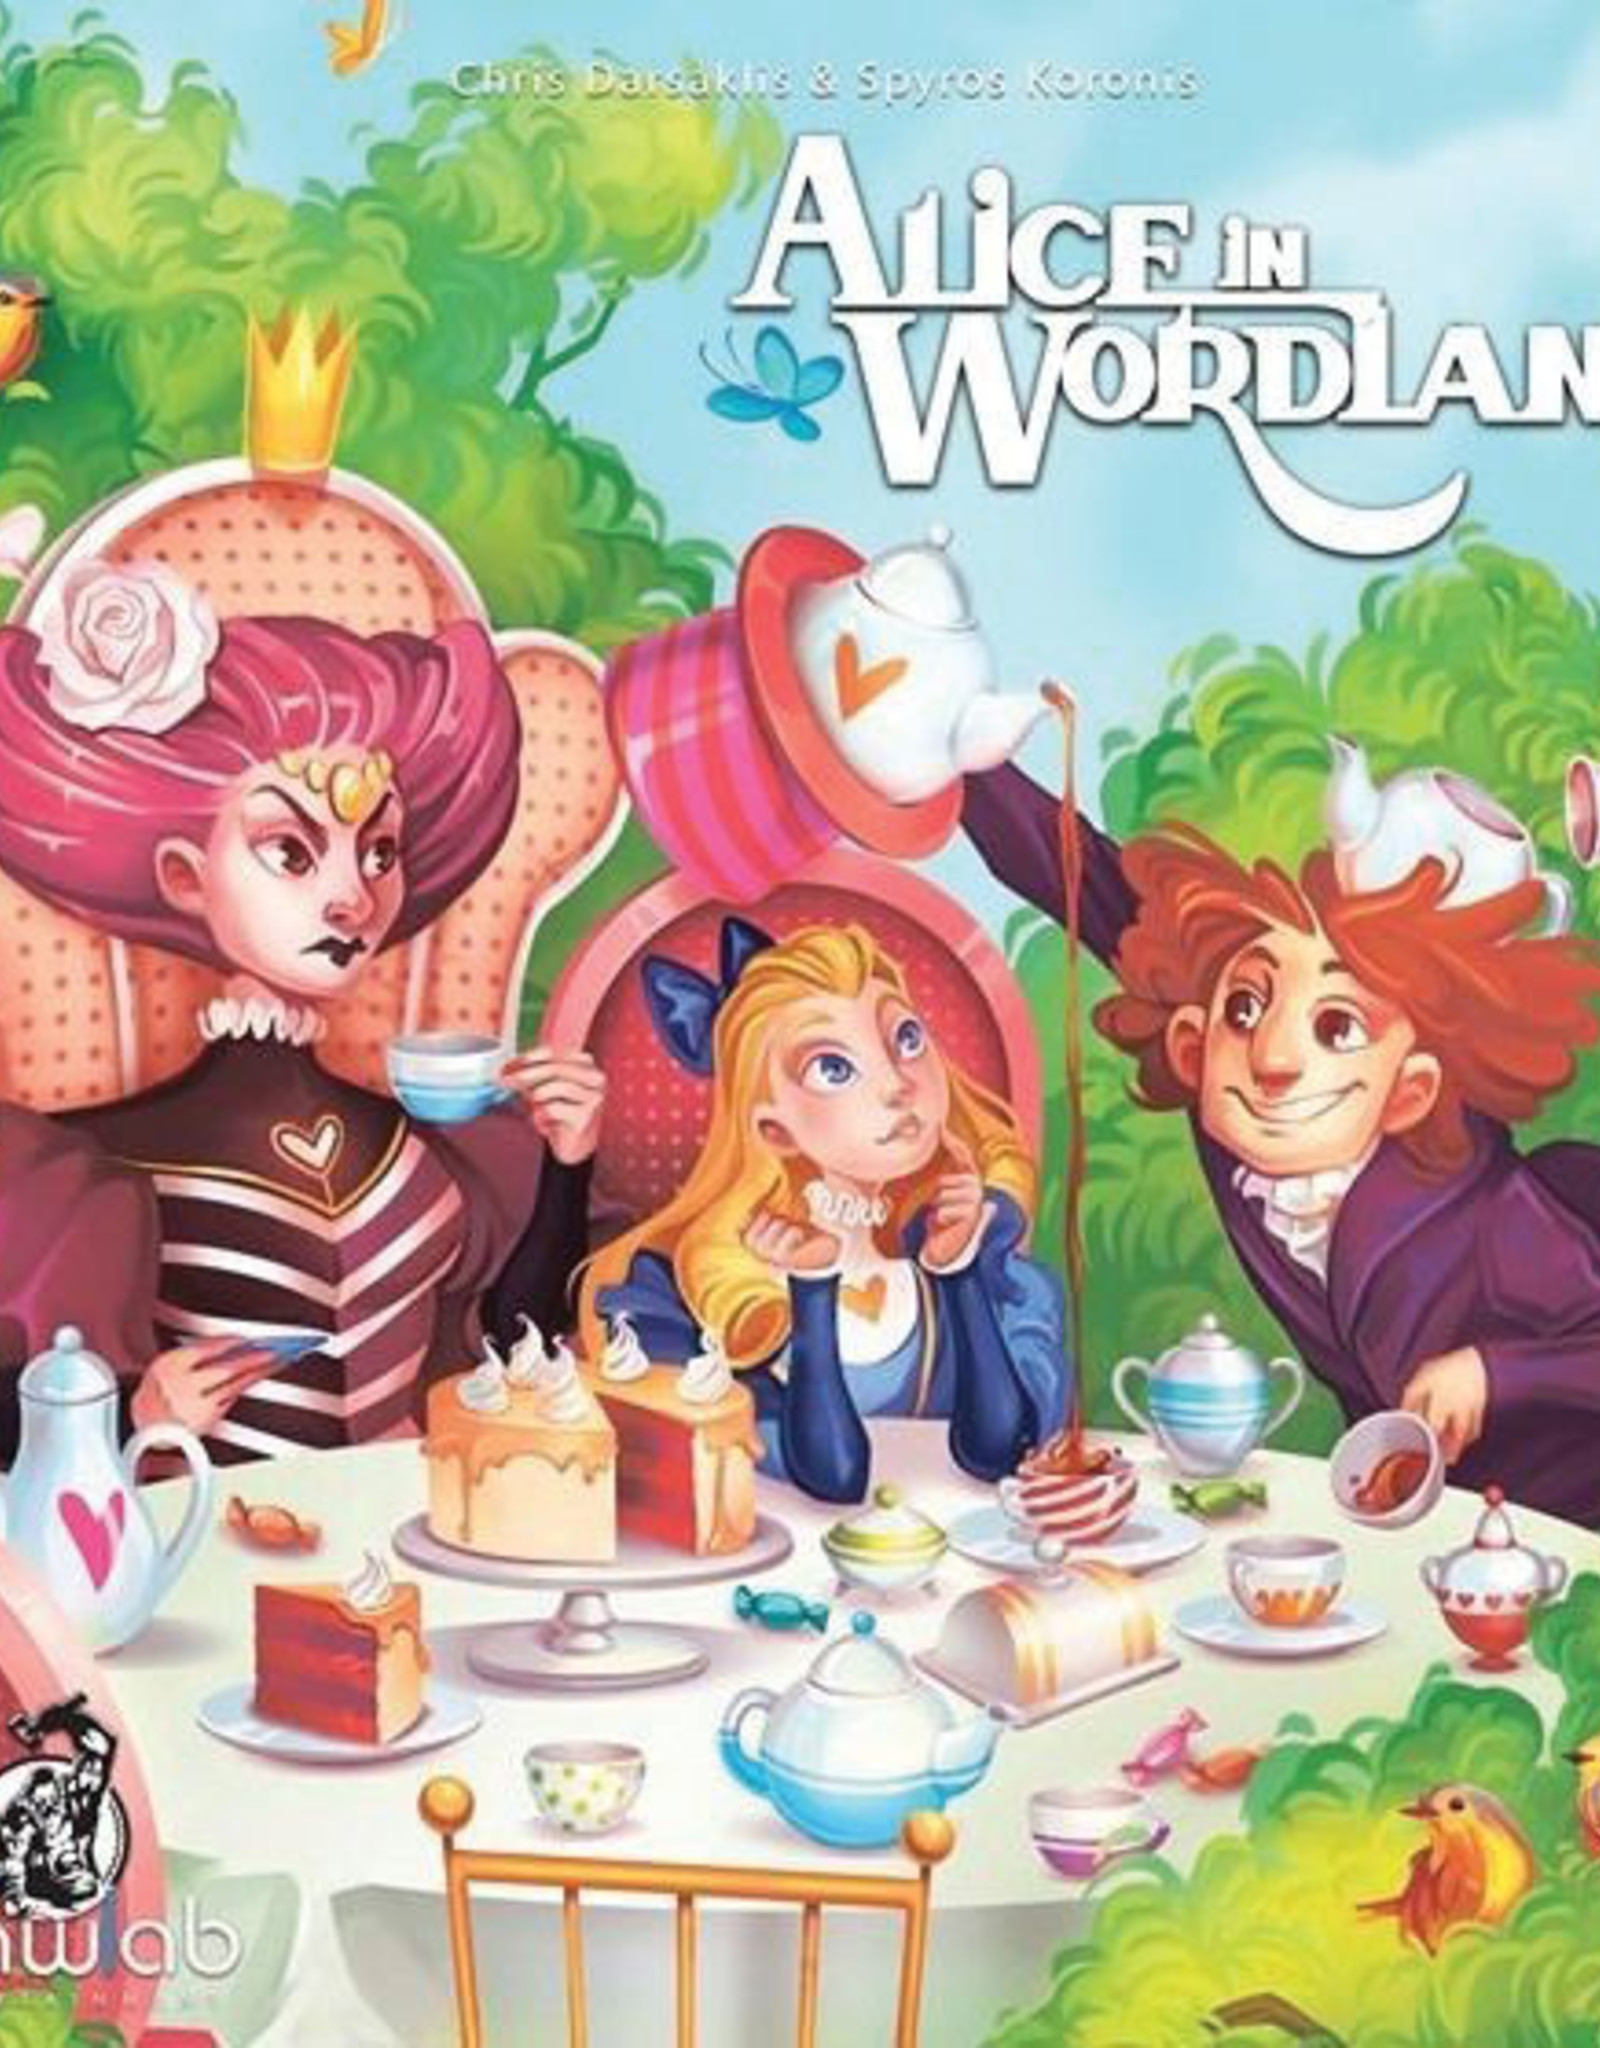 Alice in Wordland